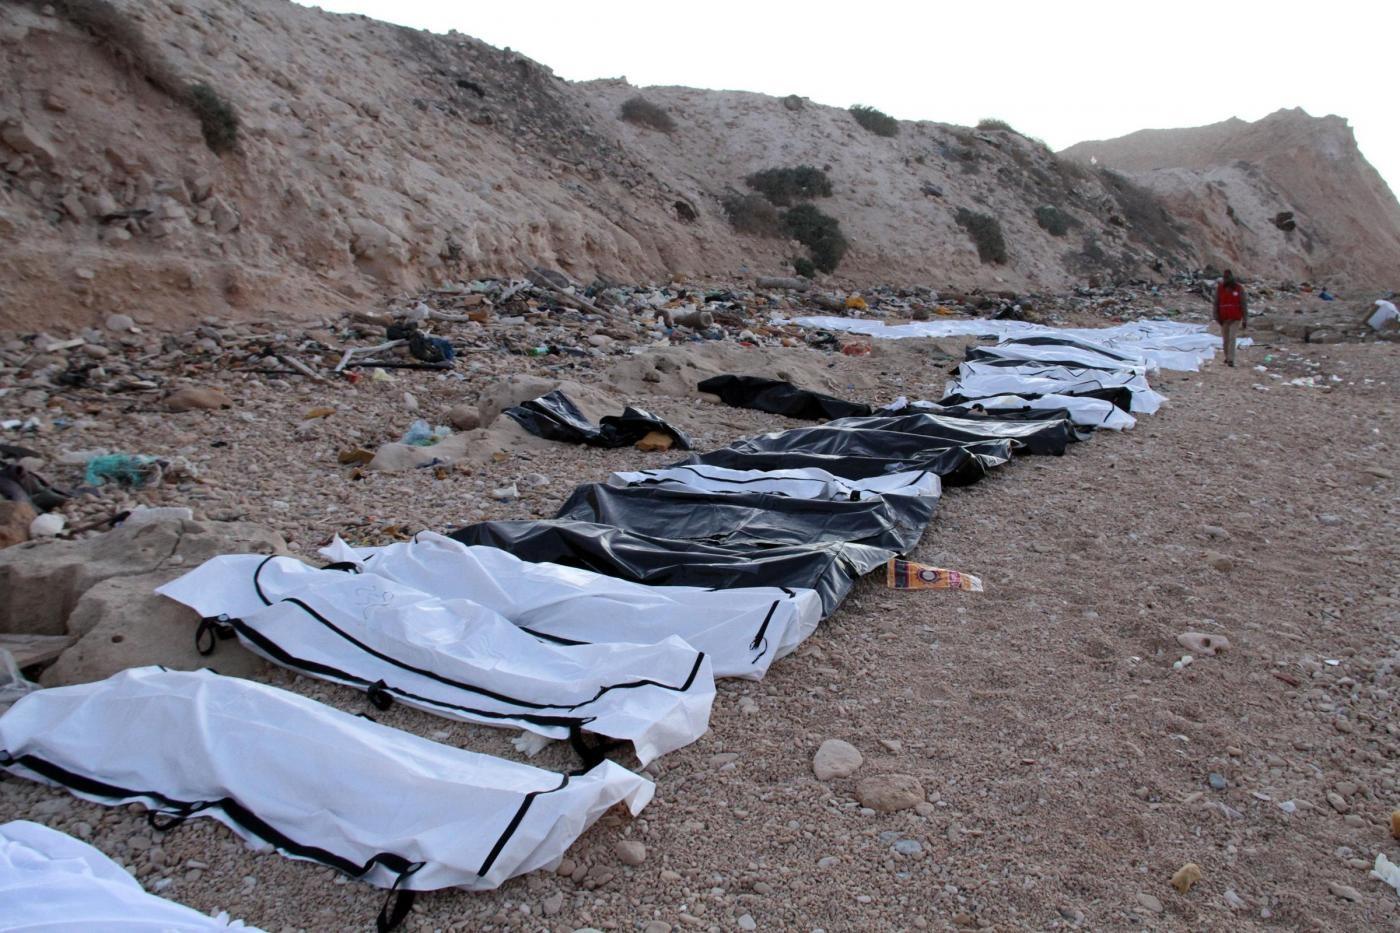 Libia, migranti morti sulla spiaggia di Zawiya